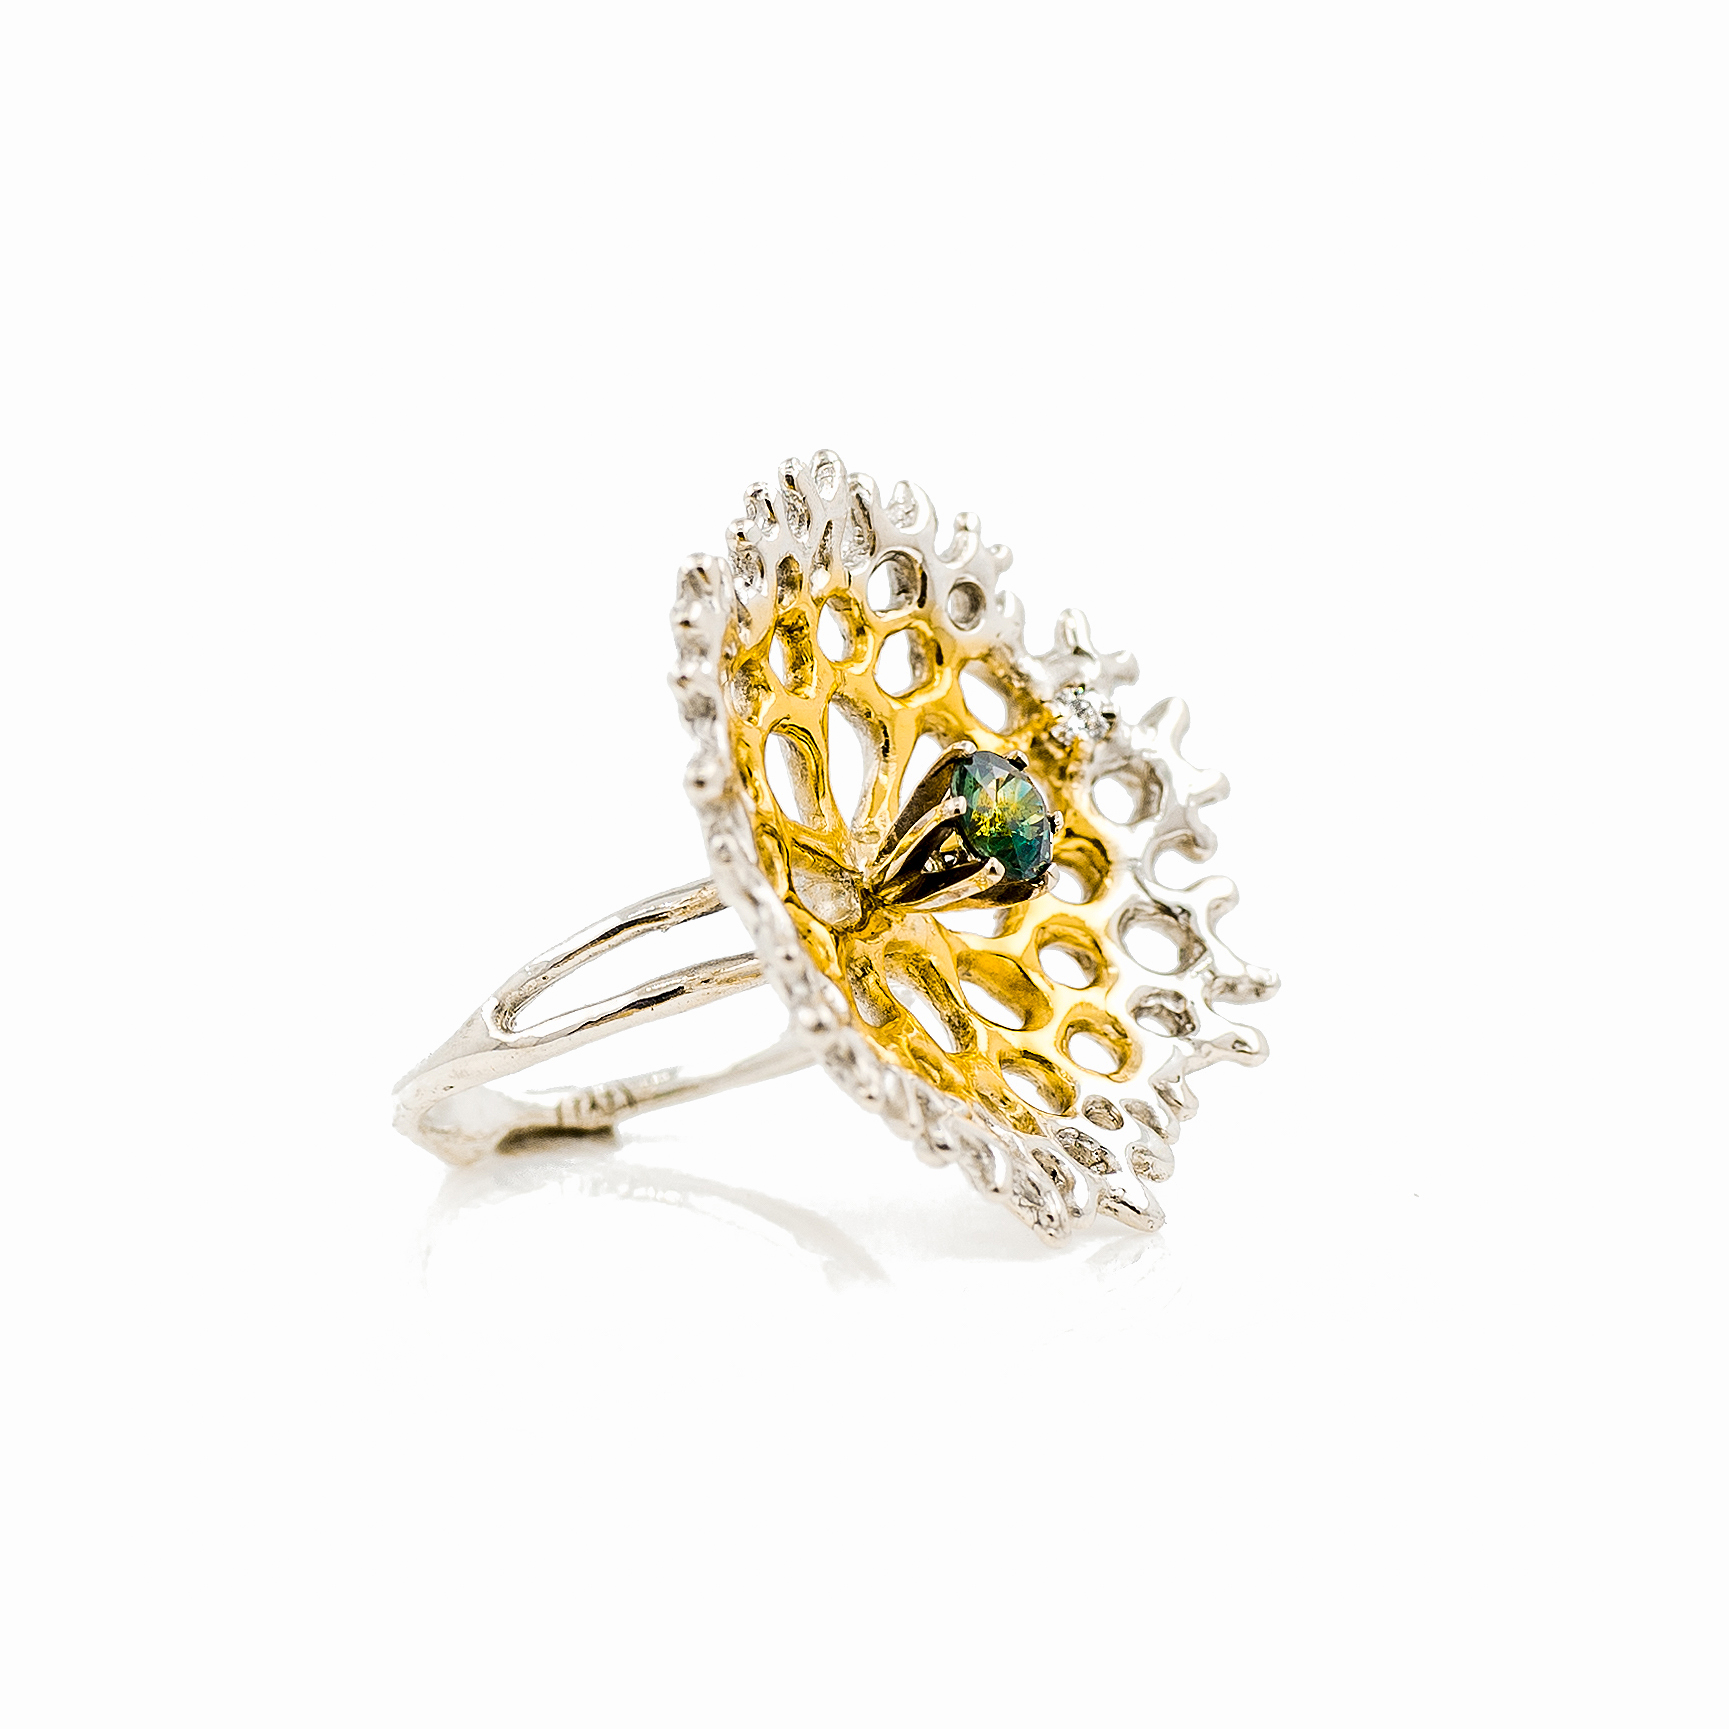 Medium Radial Ring | Sterling silver, Australian sapphire, white diamond.